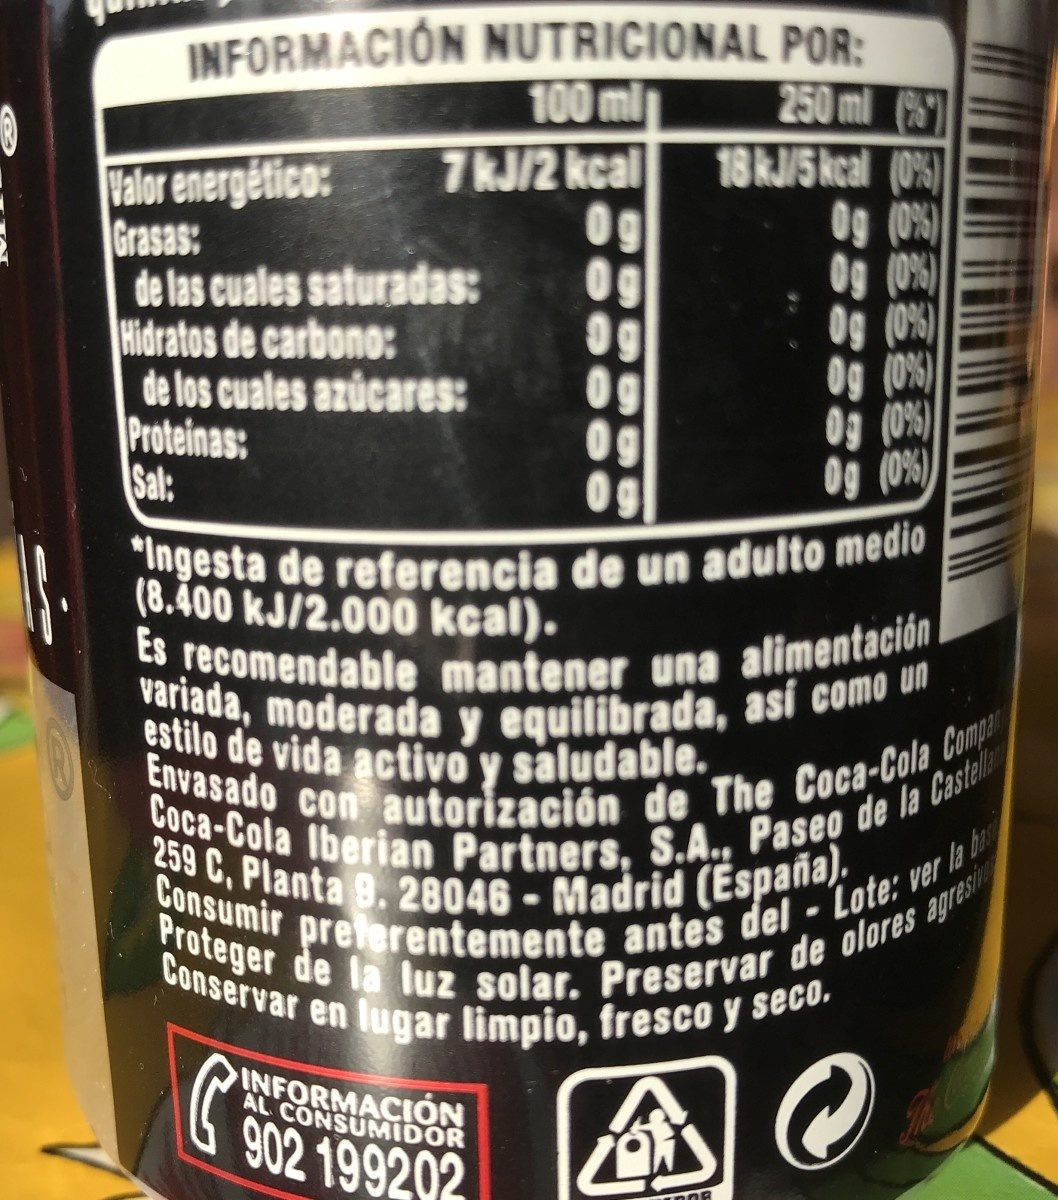 Nordic - Ingredients